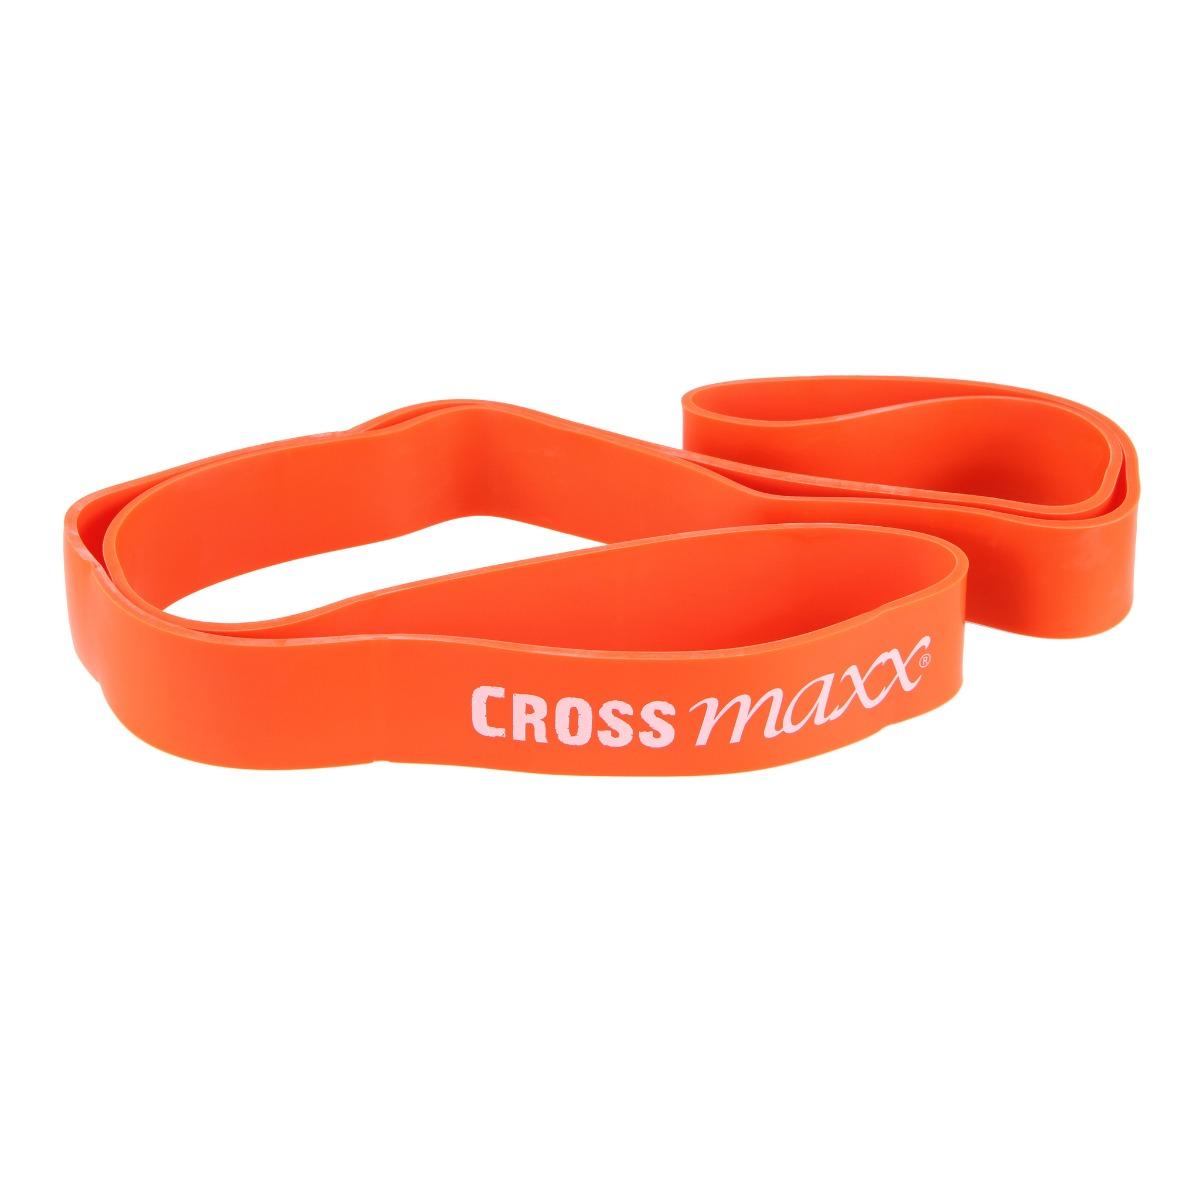 LMX Crossmaxx Weerstandsband 104 cm - Niveau 3 - Oranje - jokasport.nl